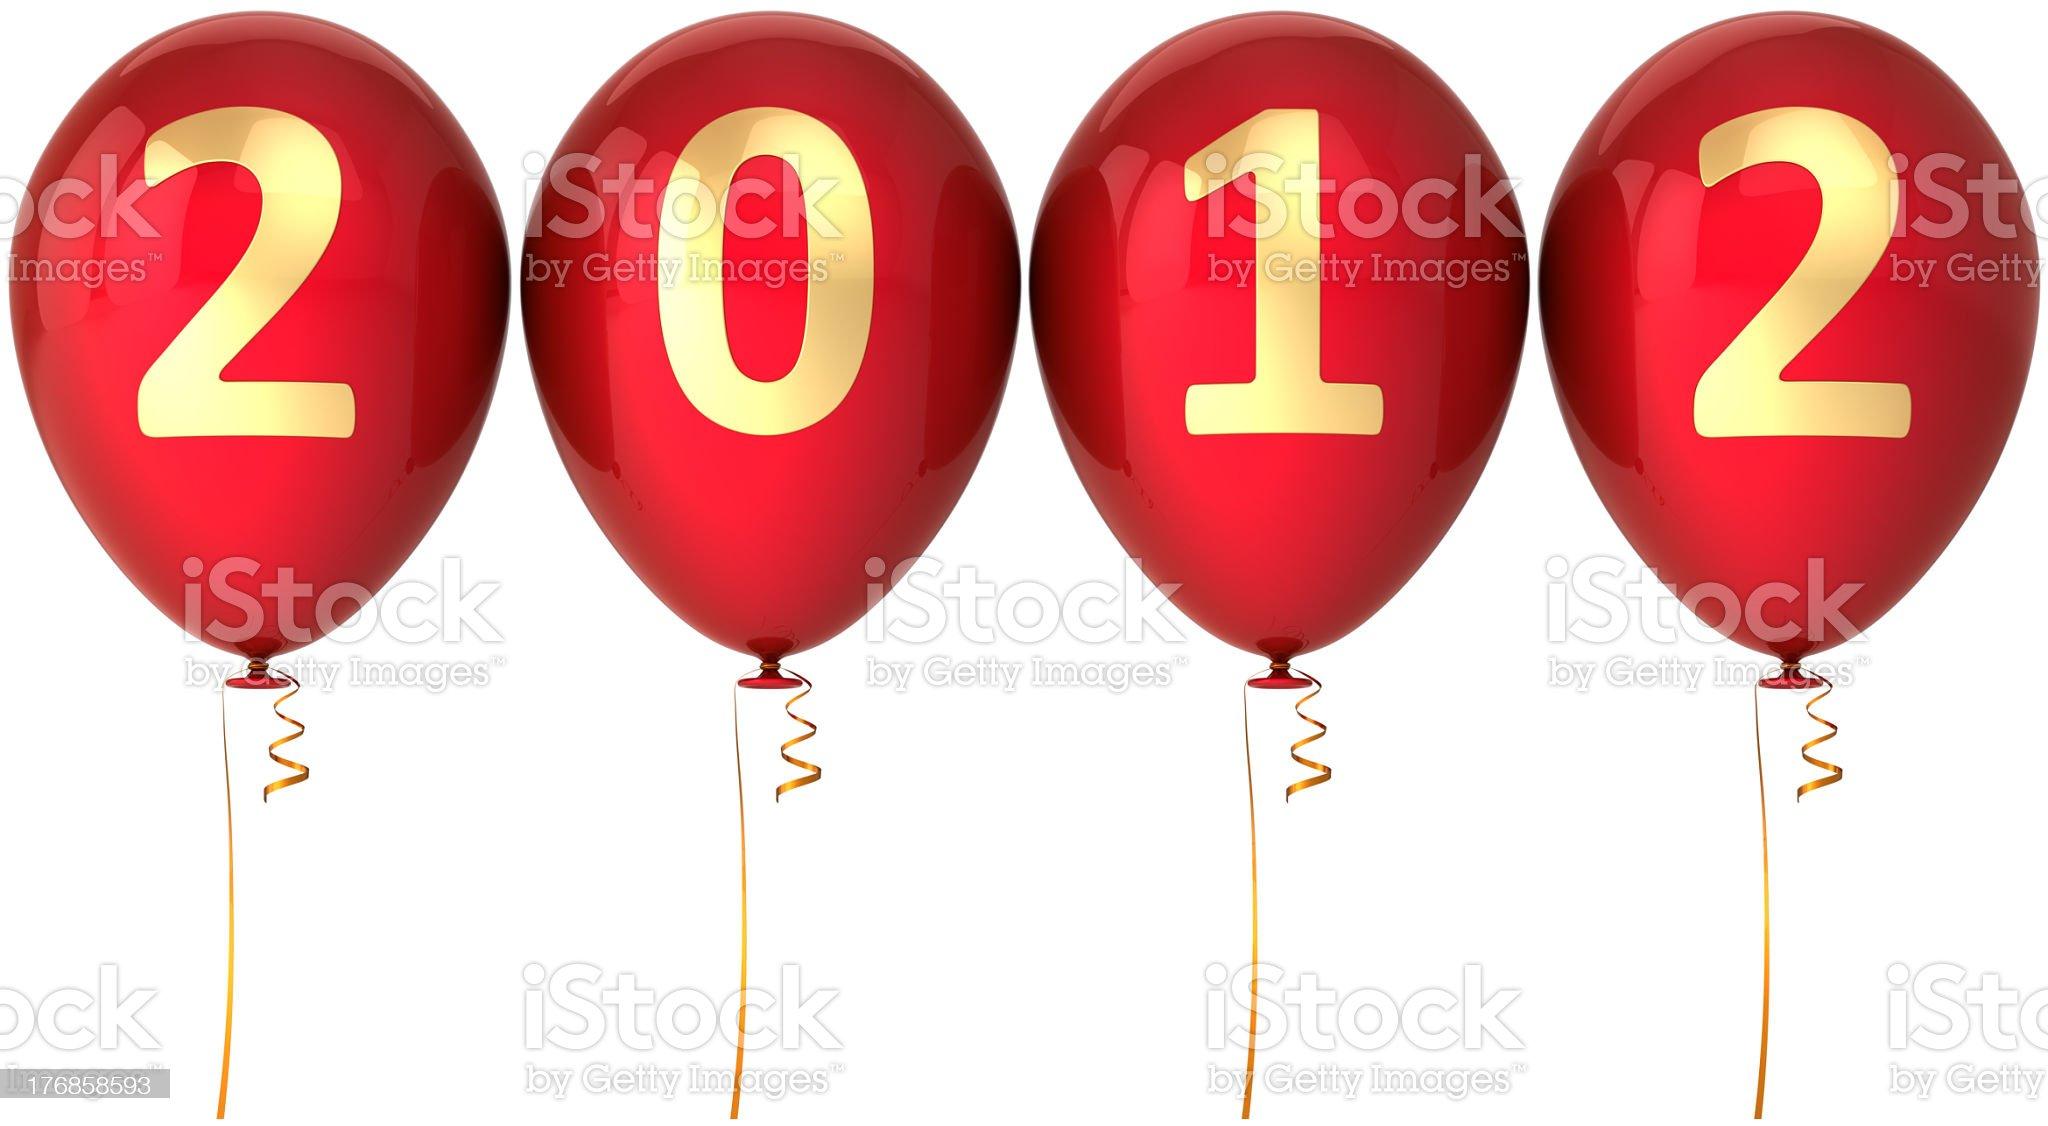 New 2012 Year balloons decoration royalty-free stock photo